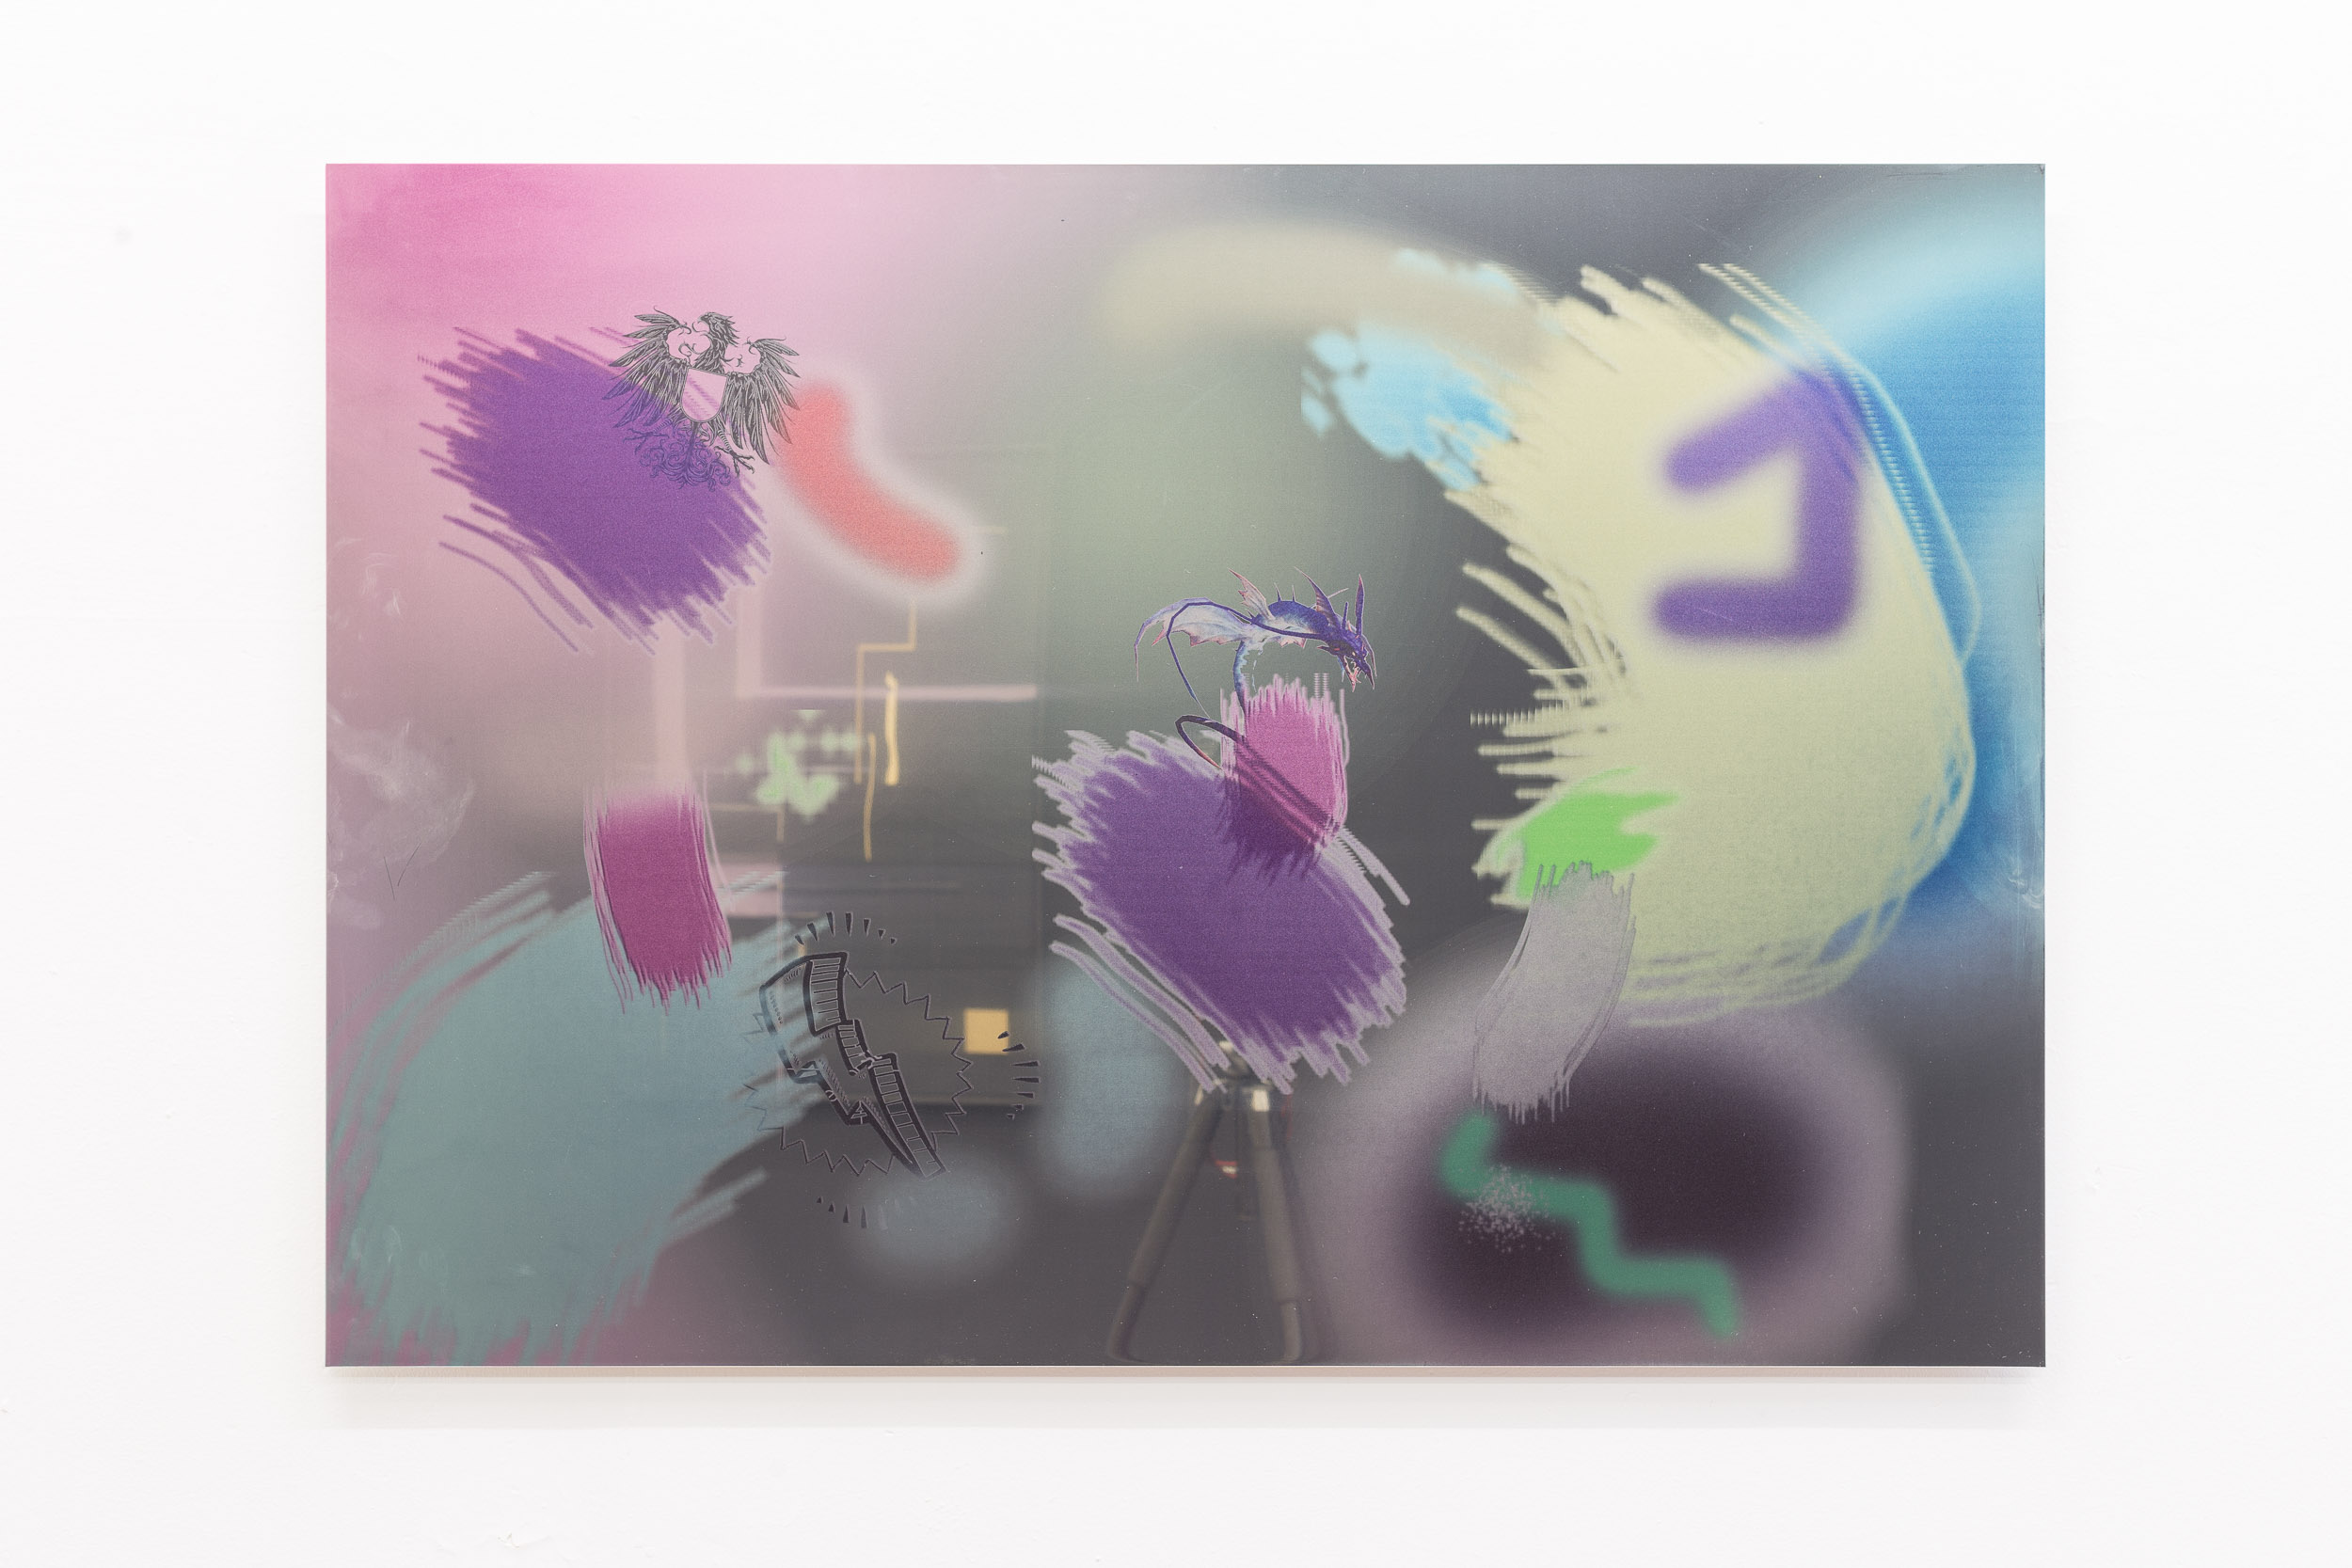 Matyas Chochola,    MIAMI NIGHTS VOL.2   ,   2016  ,   Print on stainless steel, 100 × 50 cm   Photo: Kilian Bannwart